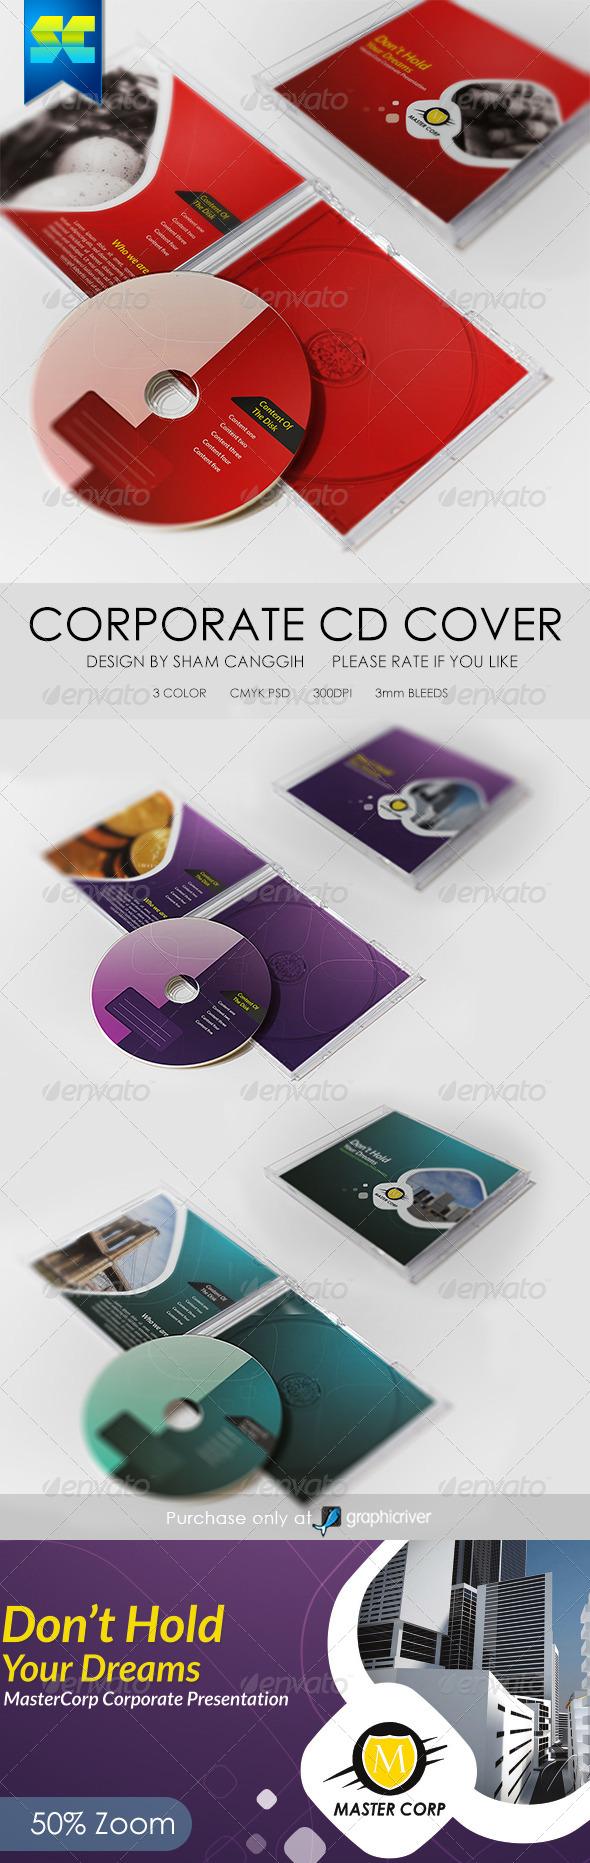 GraphicRiver Modern Corporate CD Cover Artwork 6339239